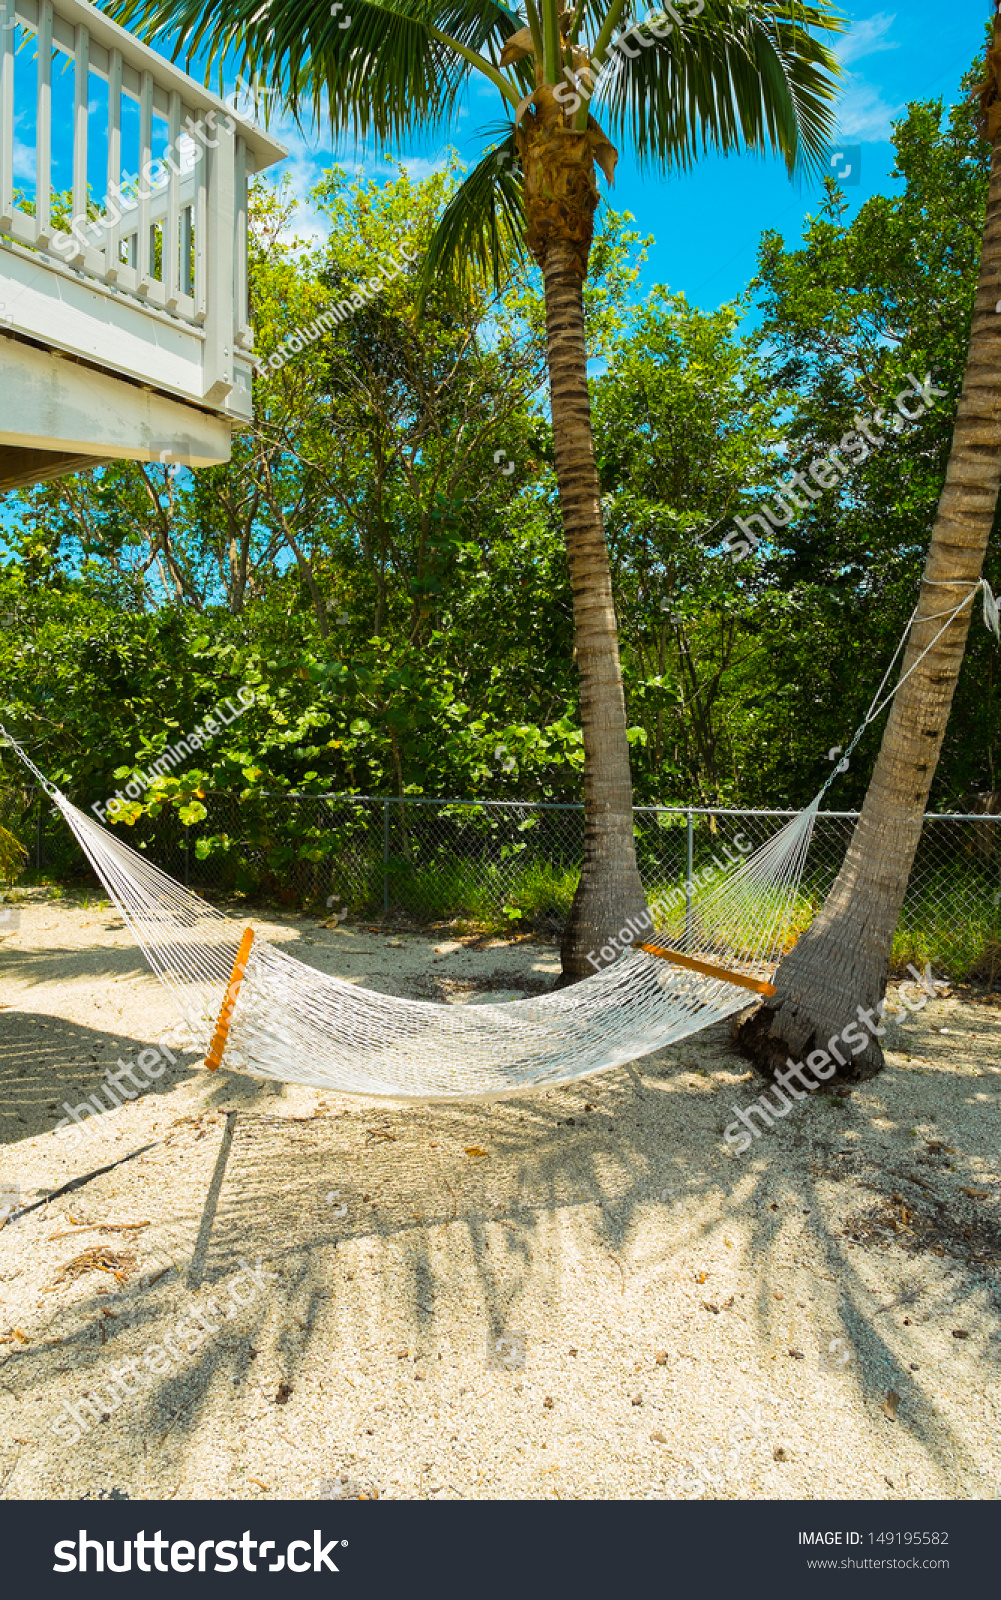 hammock hanging palm tree backyard florida stock photo 149195582